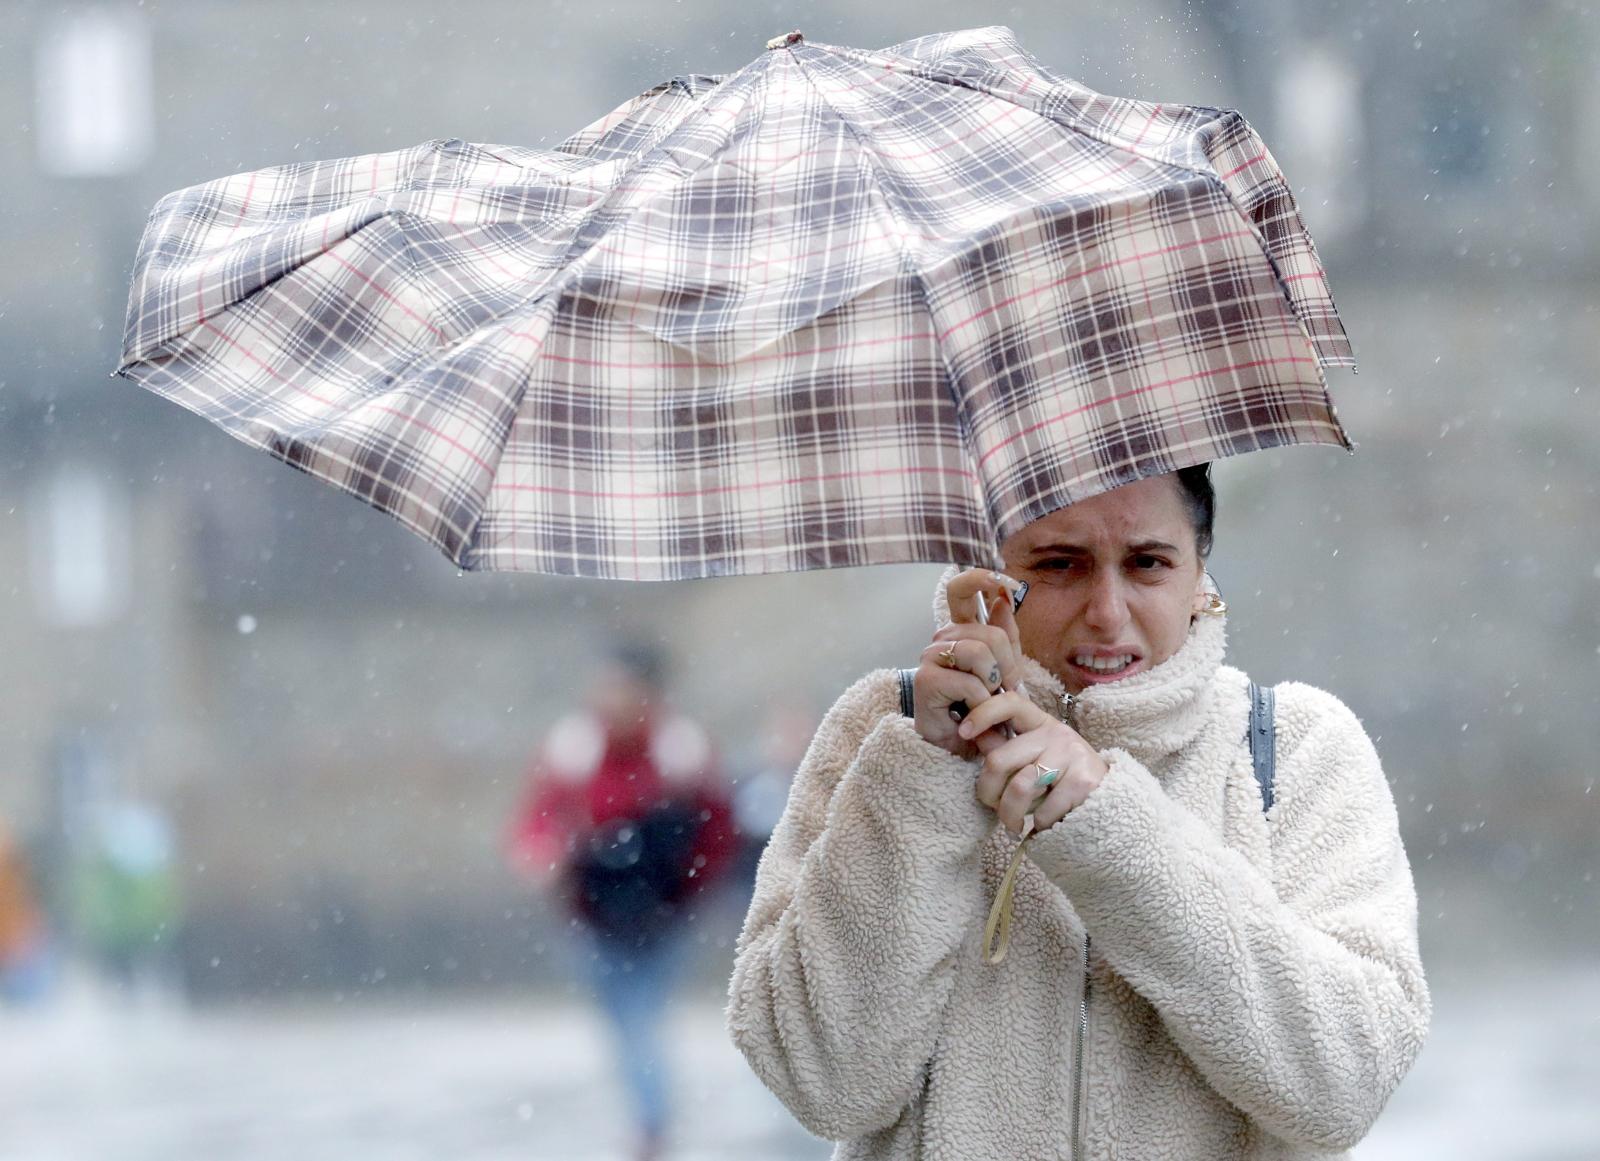 Aktualna pogoda w Santiago de Compostela, Hiszpania. Fot. EPA/Lavandeira jr